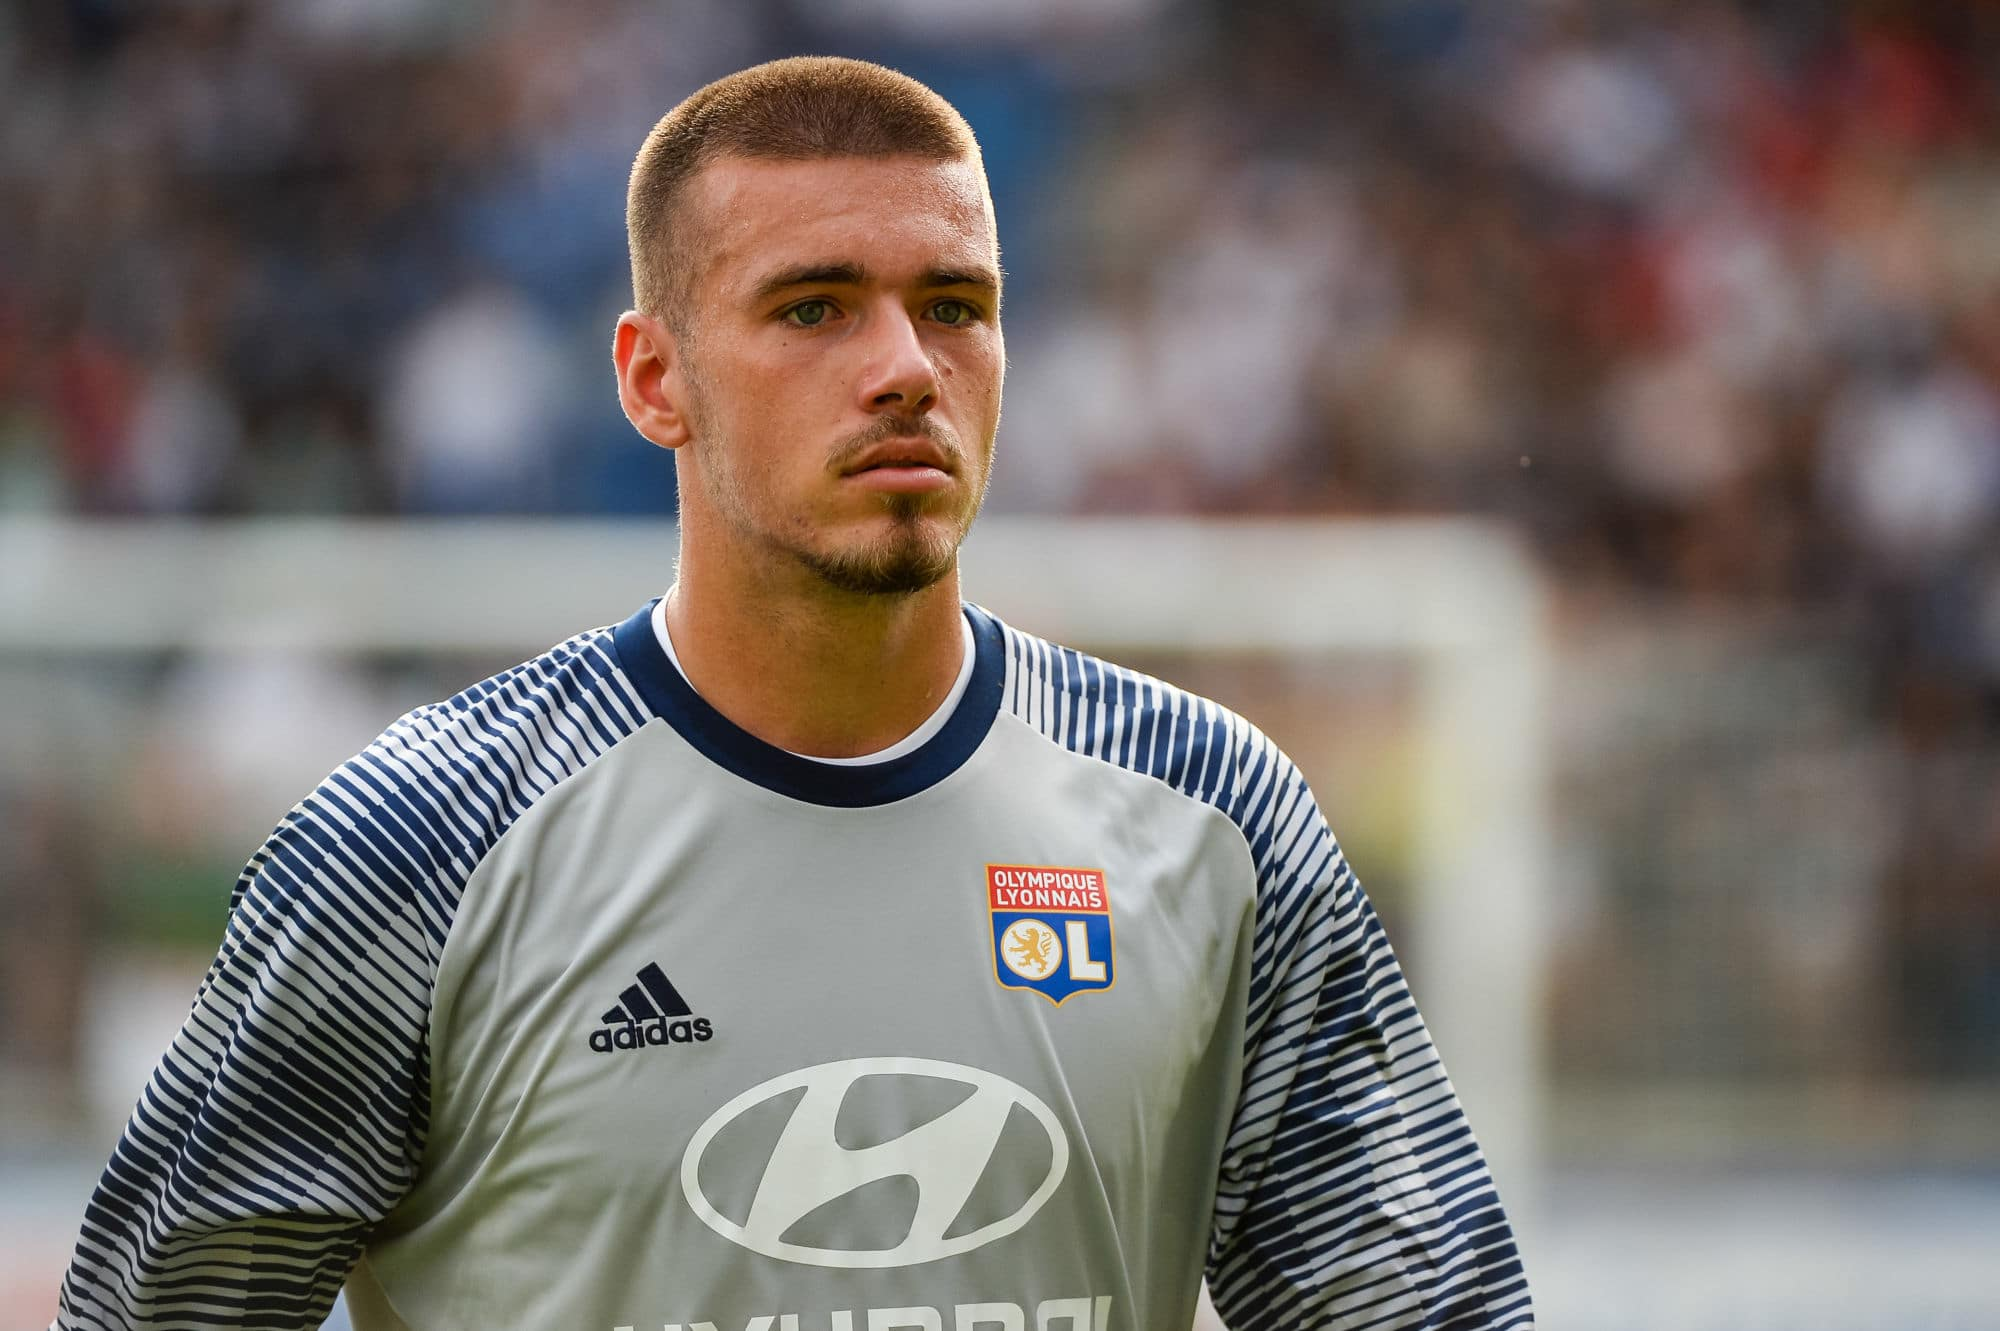 Le gardien lyonnais Anthony Racioppi ne viendra pas à Caen (RMC Sports)